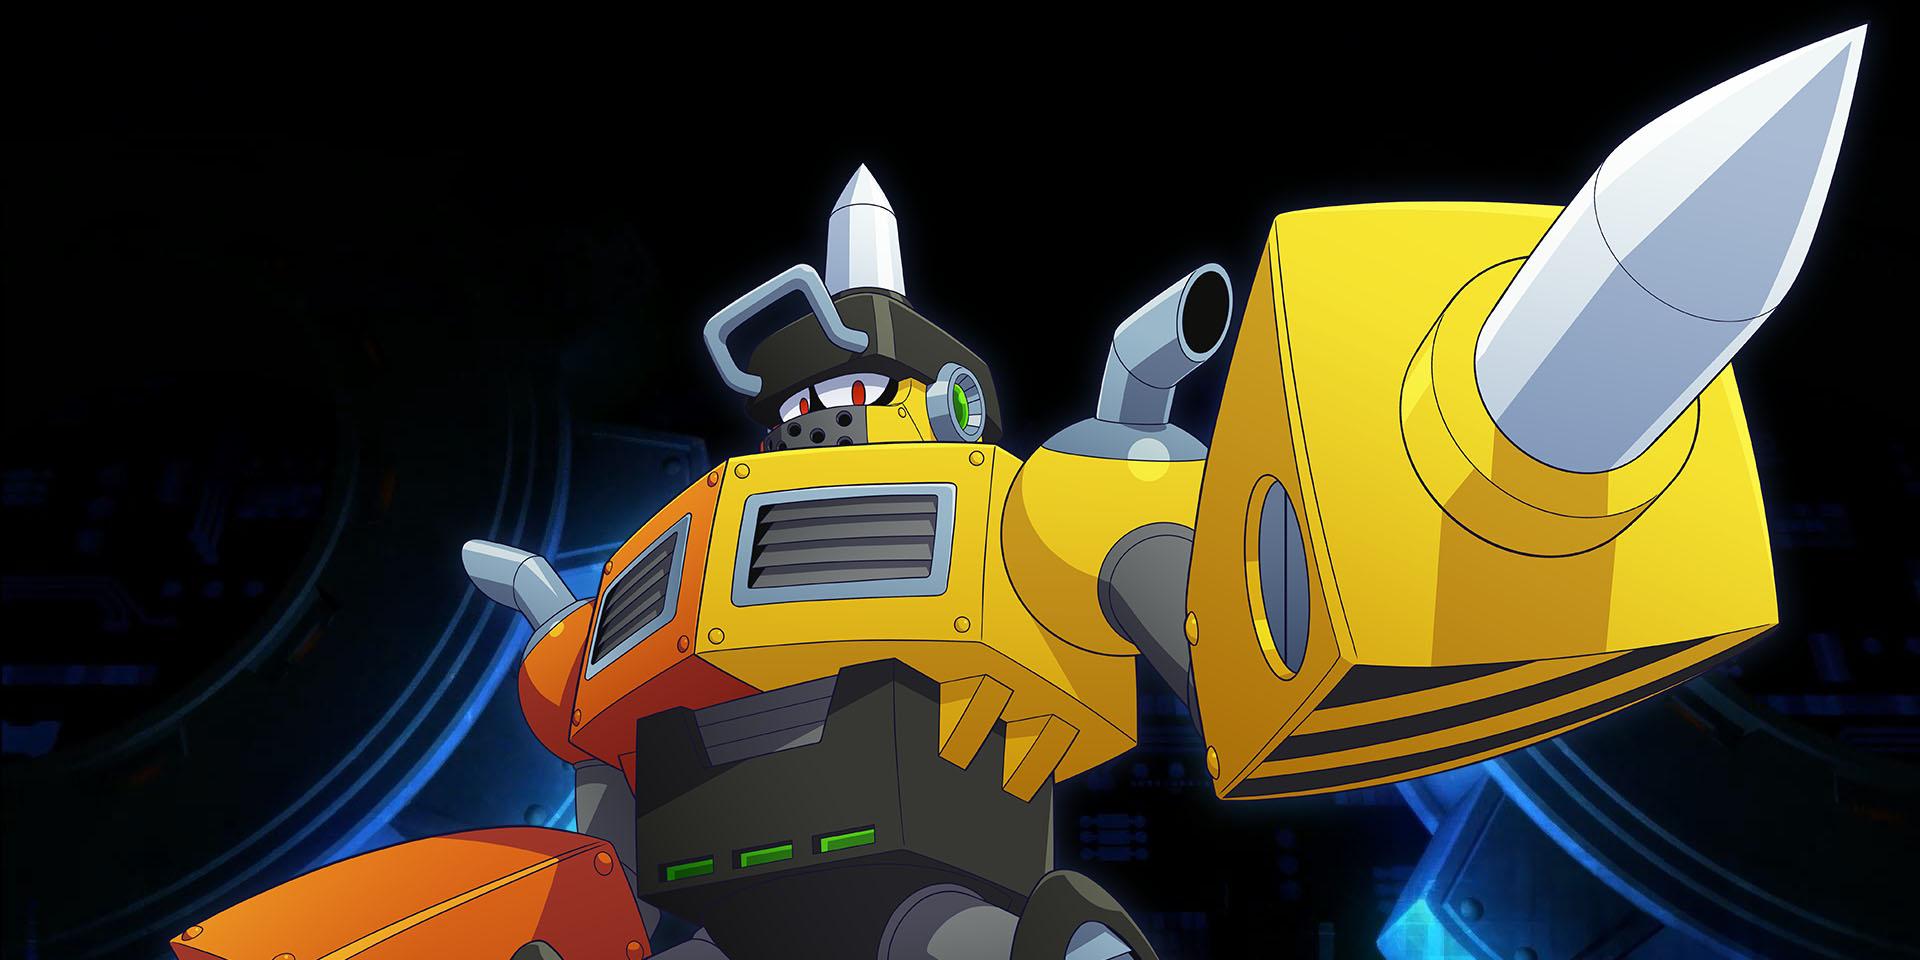 Revelado o Impact Man para Mega Man 11